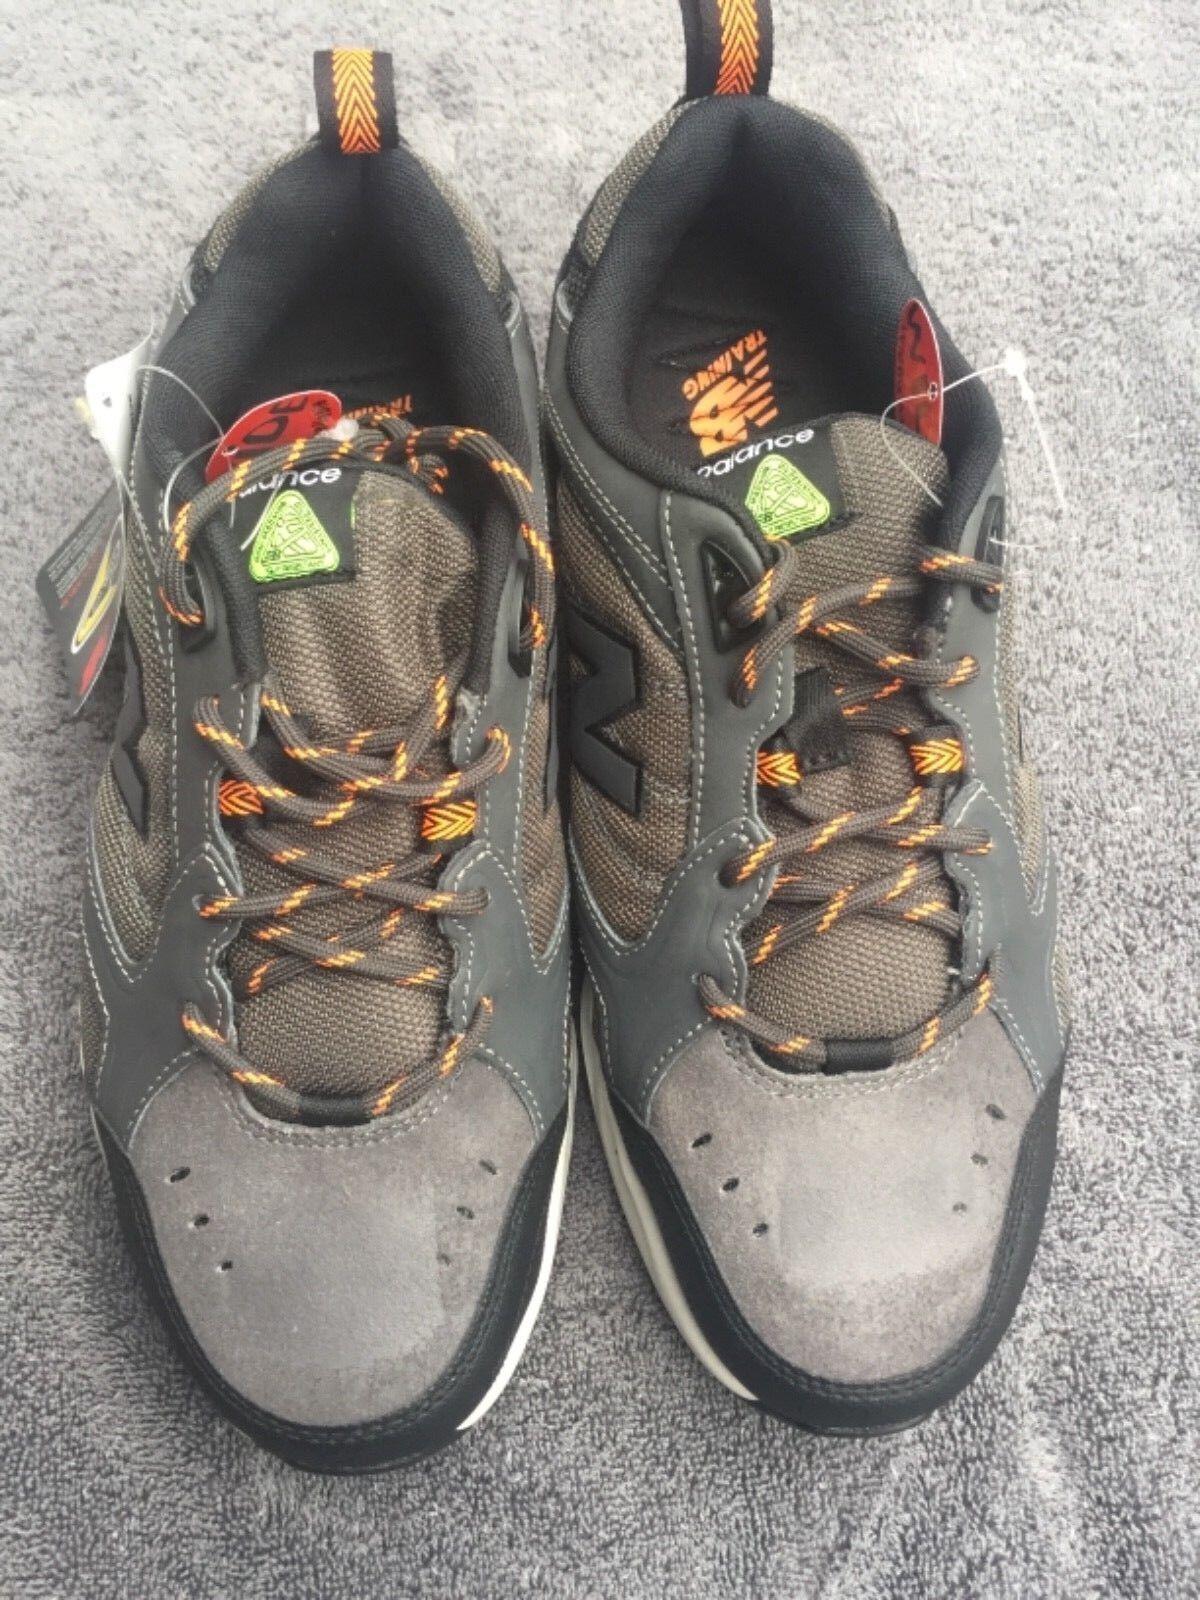 New Balance Men's Steel Toe 627 MID627G Textile shoes Size   14